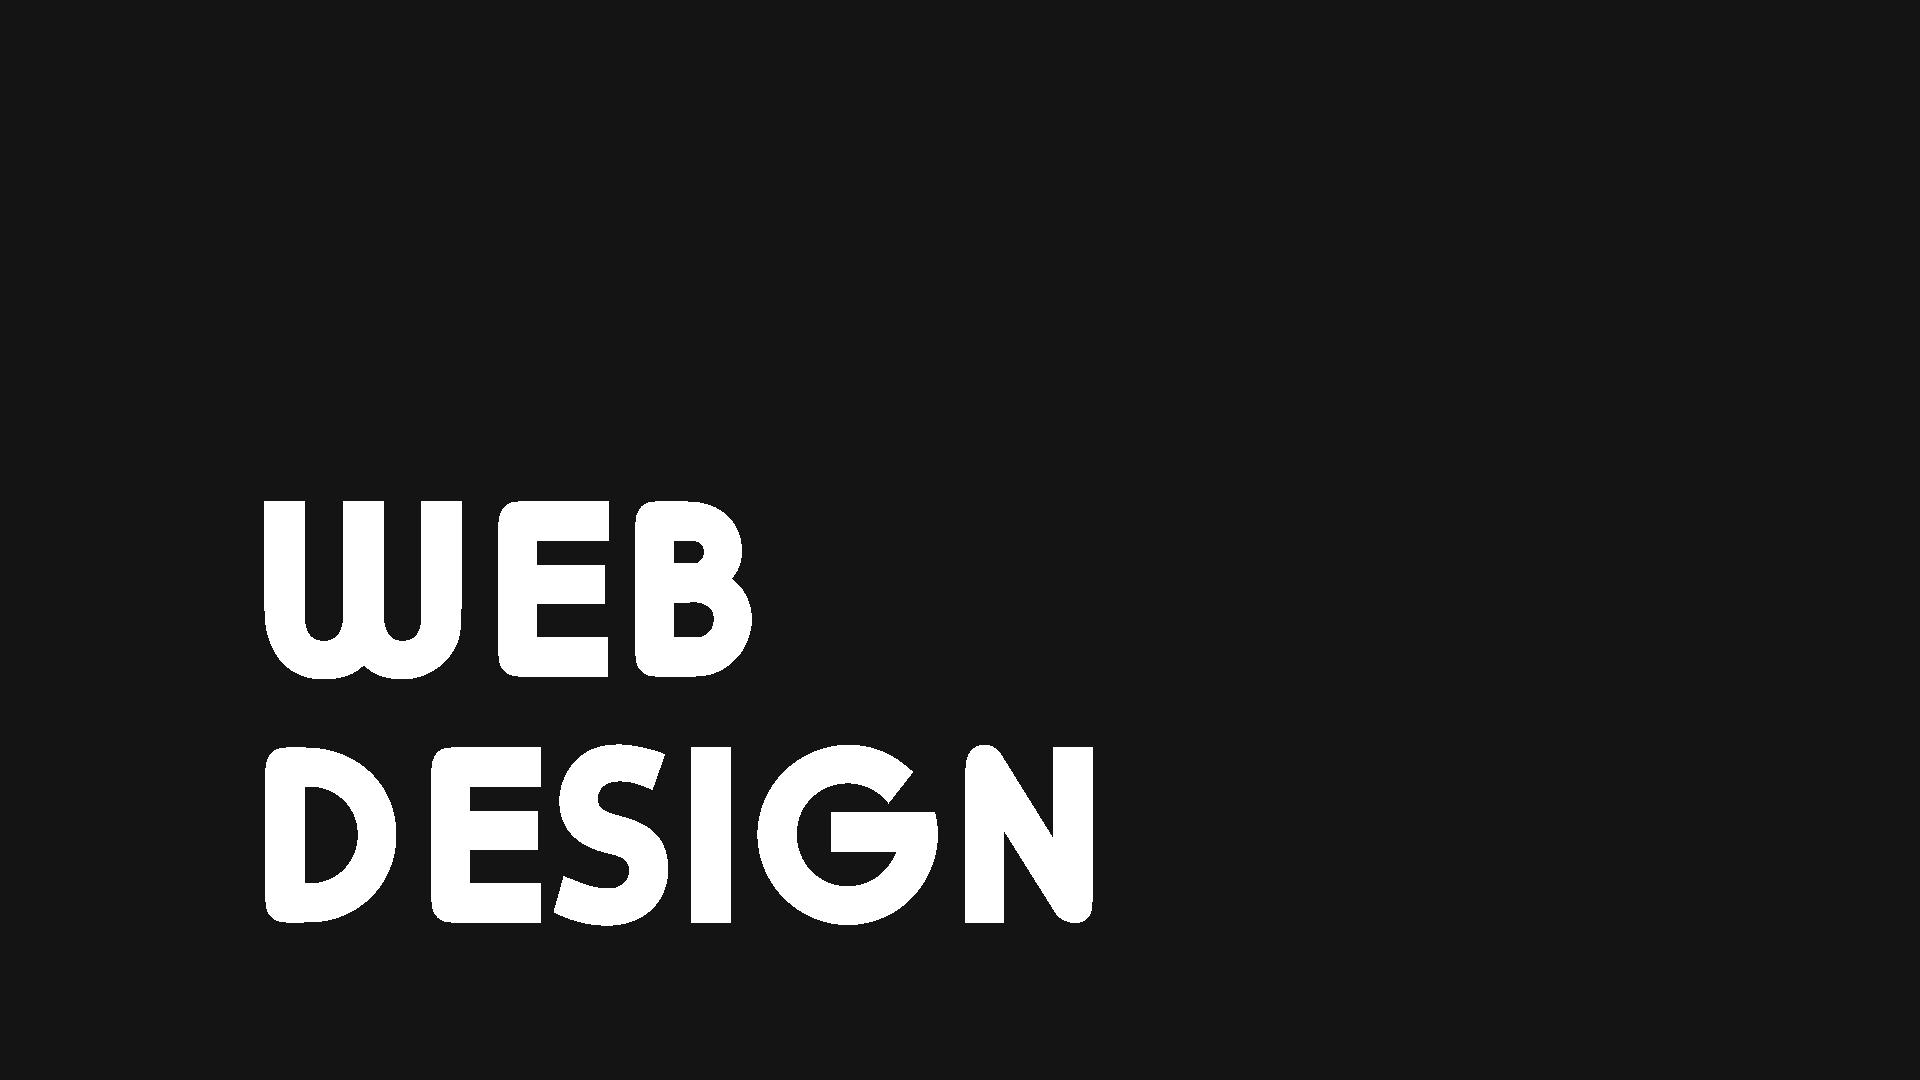 Cope Digital Agency - Website Design & Development - Κατασκευή Ιστοσελίδας